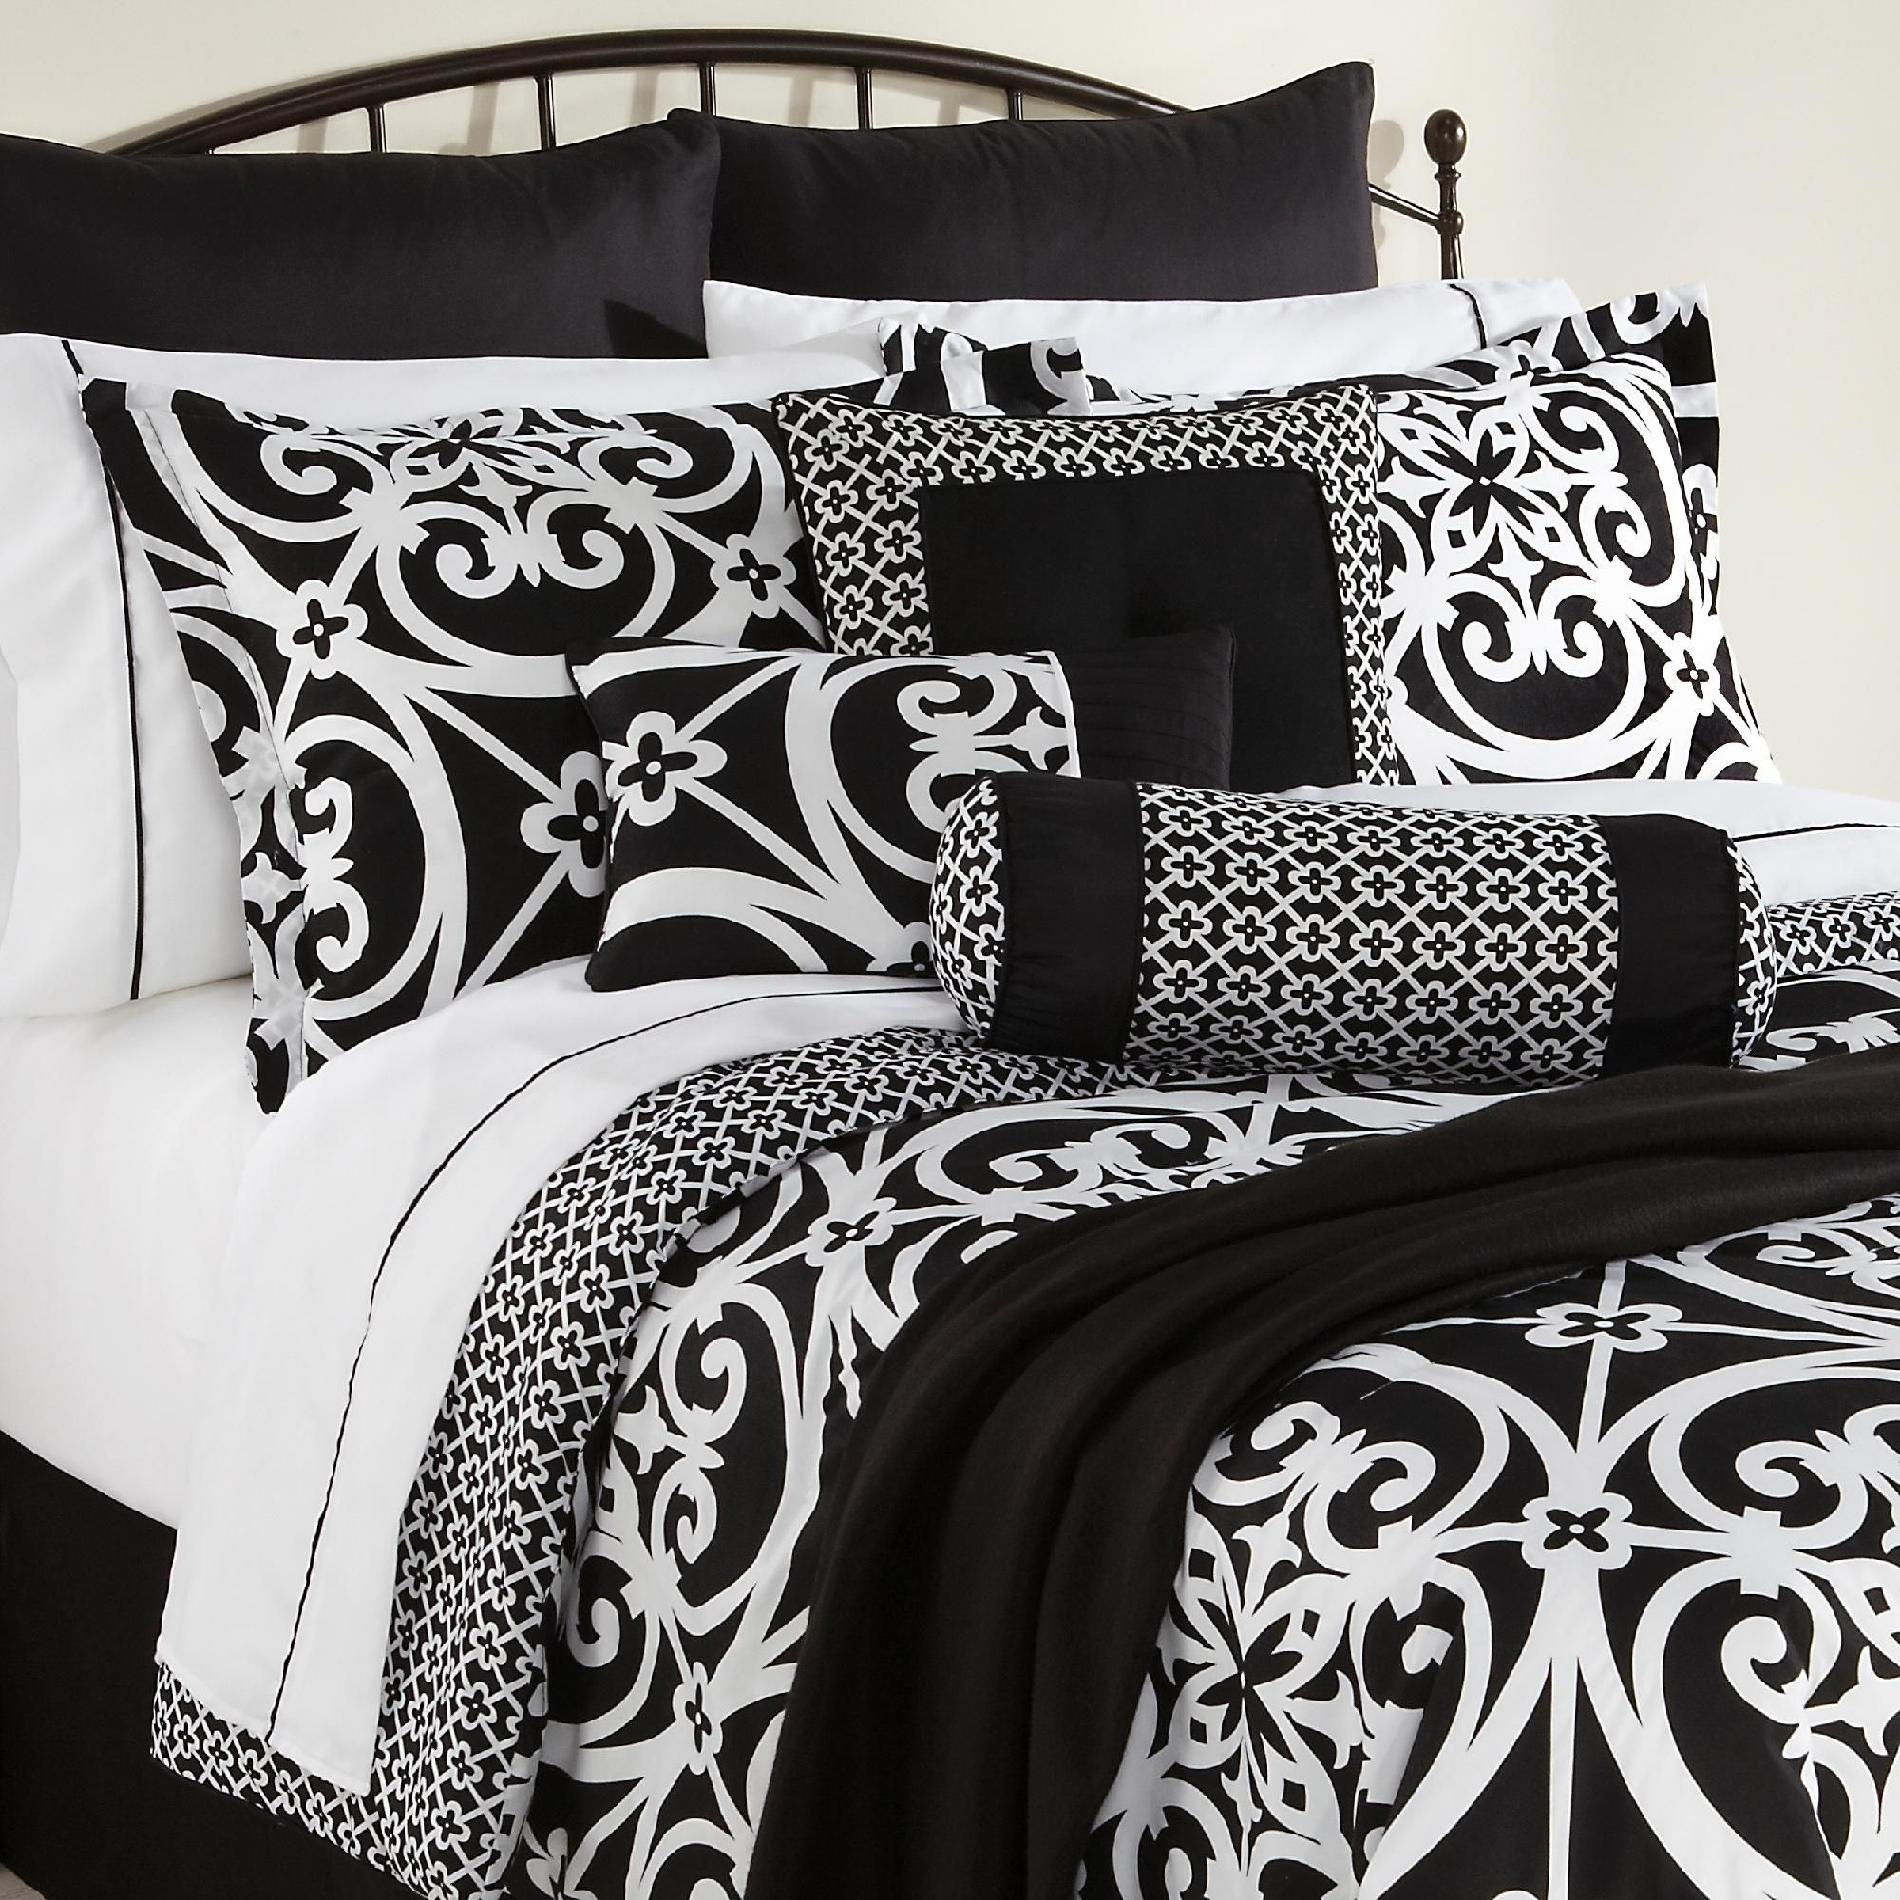 black damask bedding wwwpixsharkcom images galleries